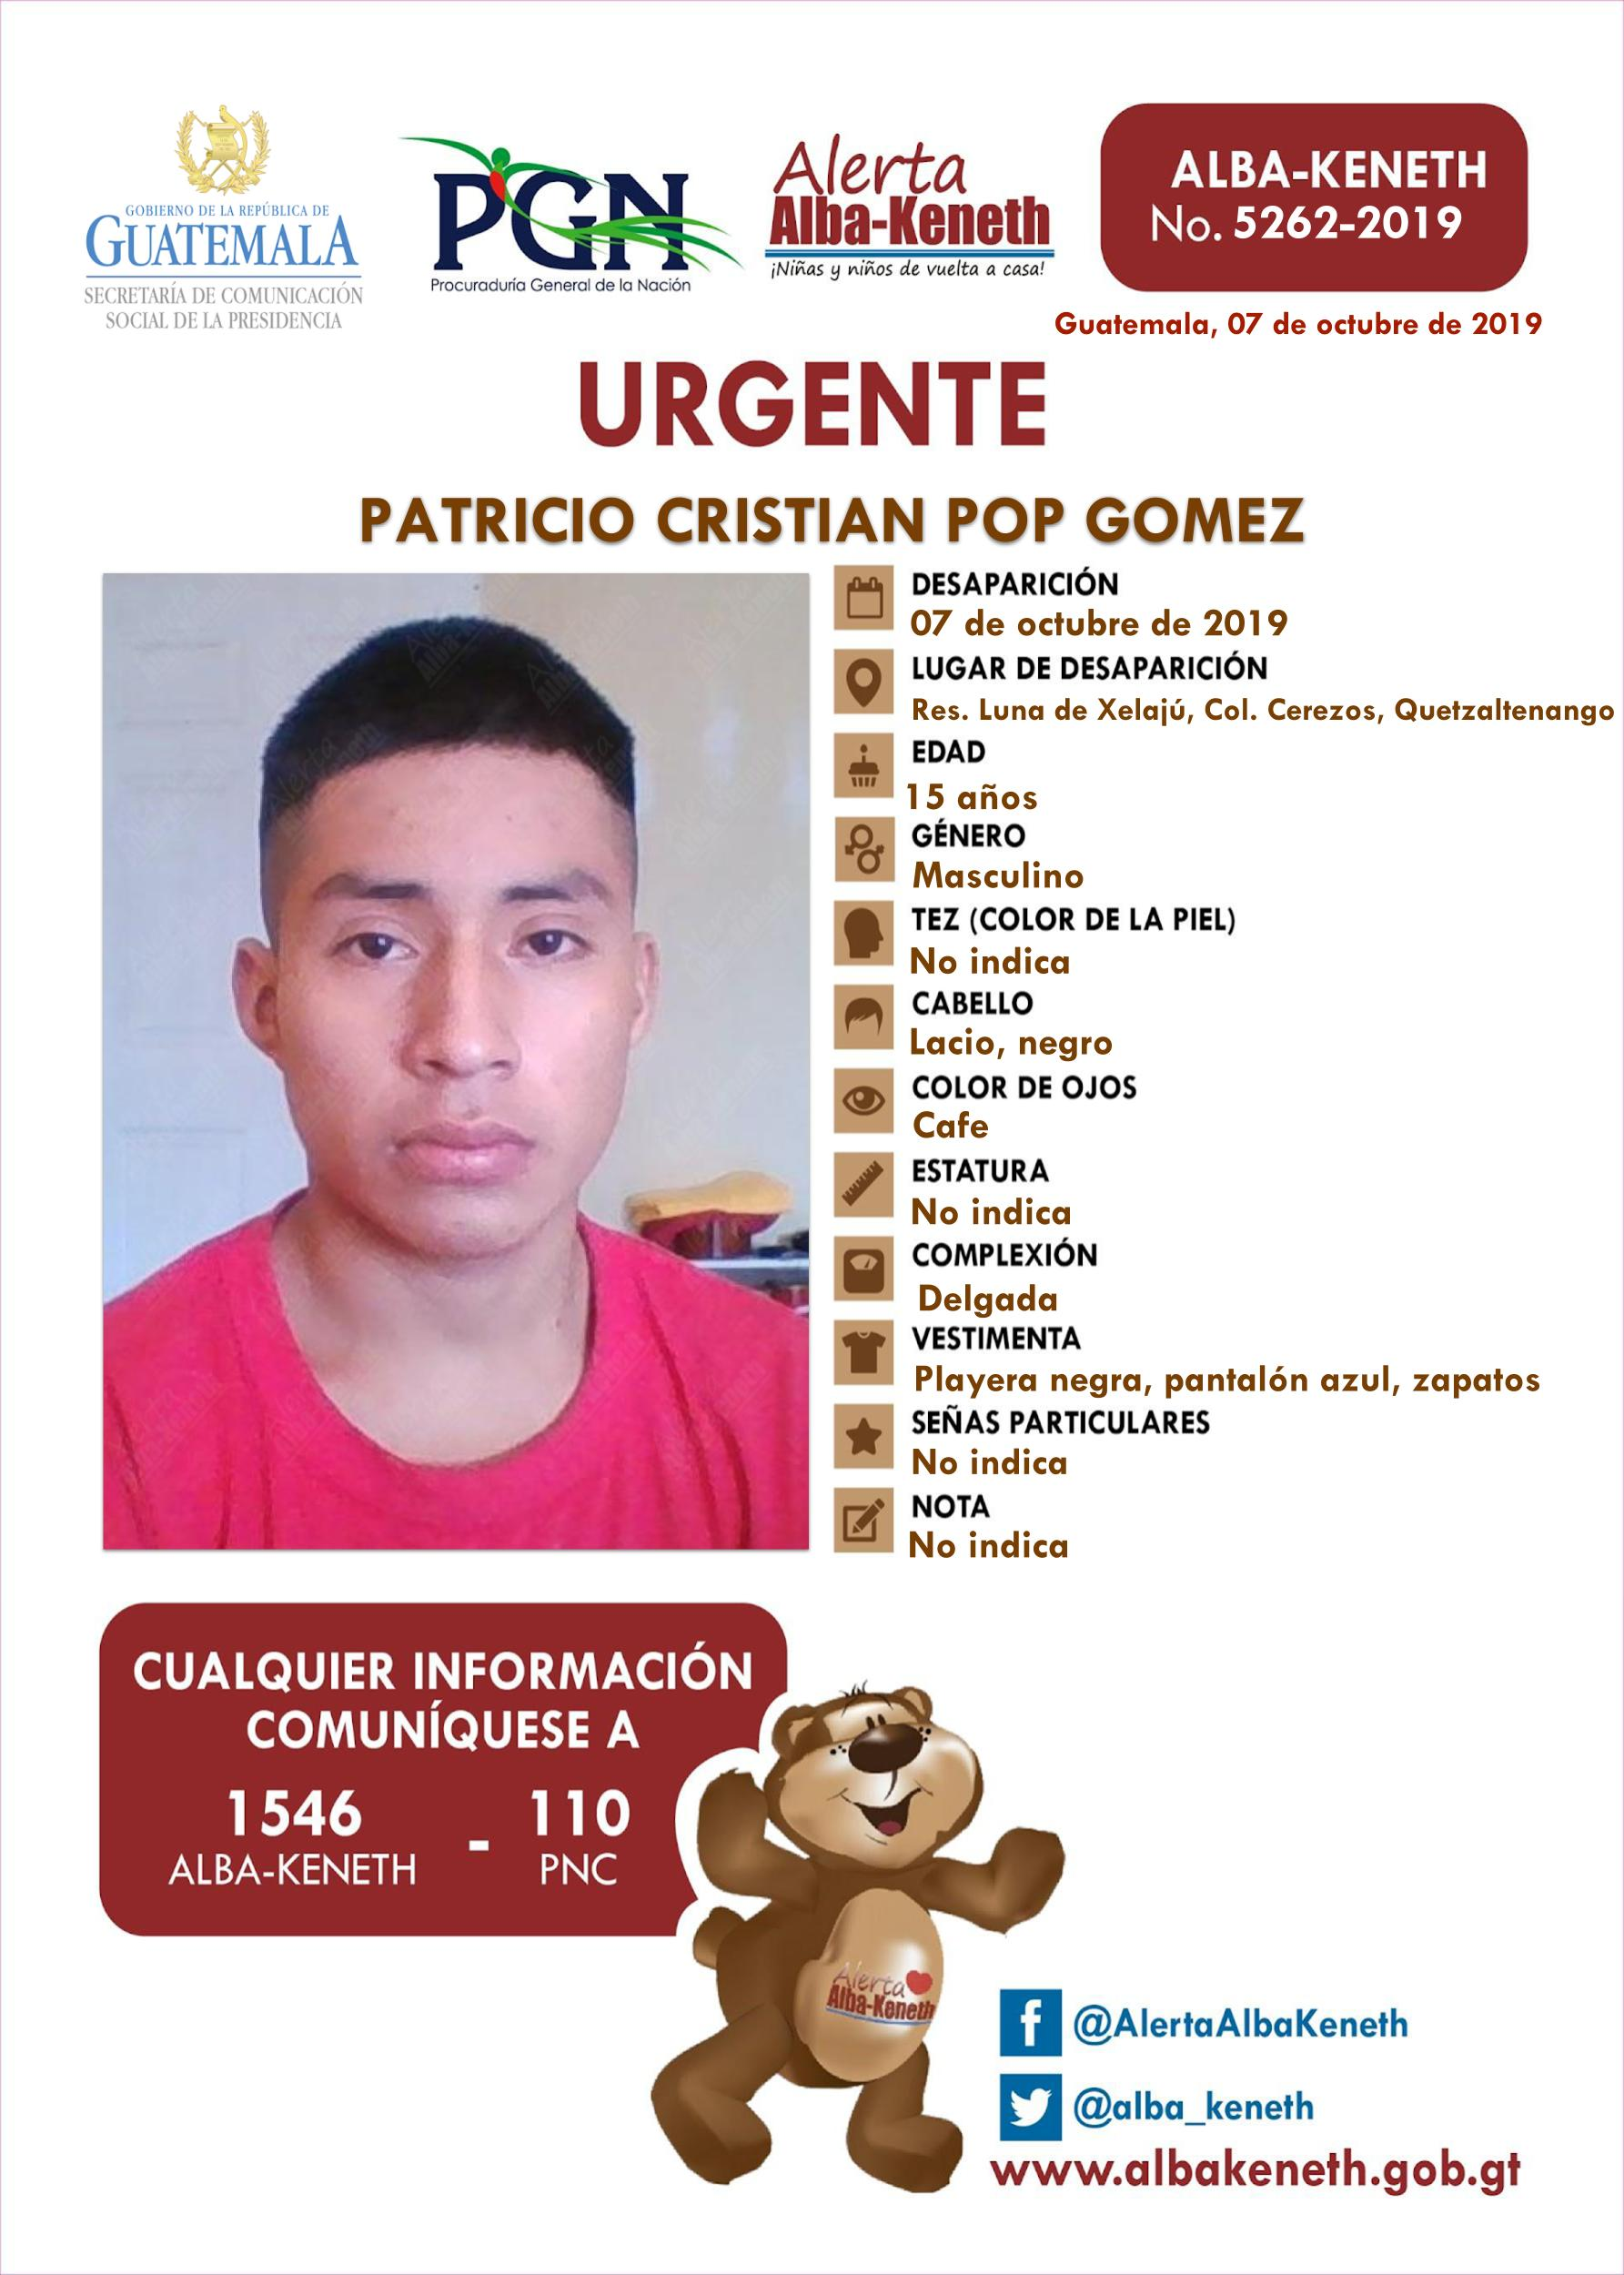 Patricio Cristian Pop Gomez